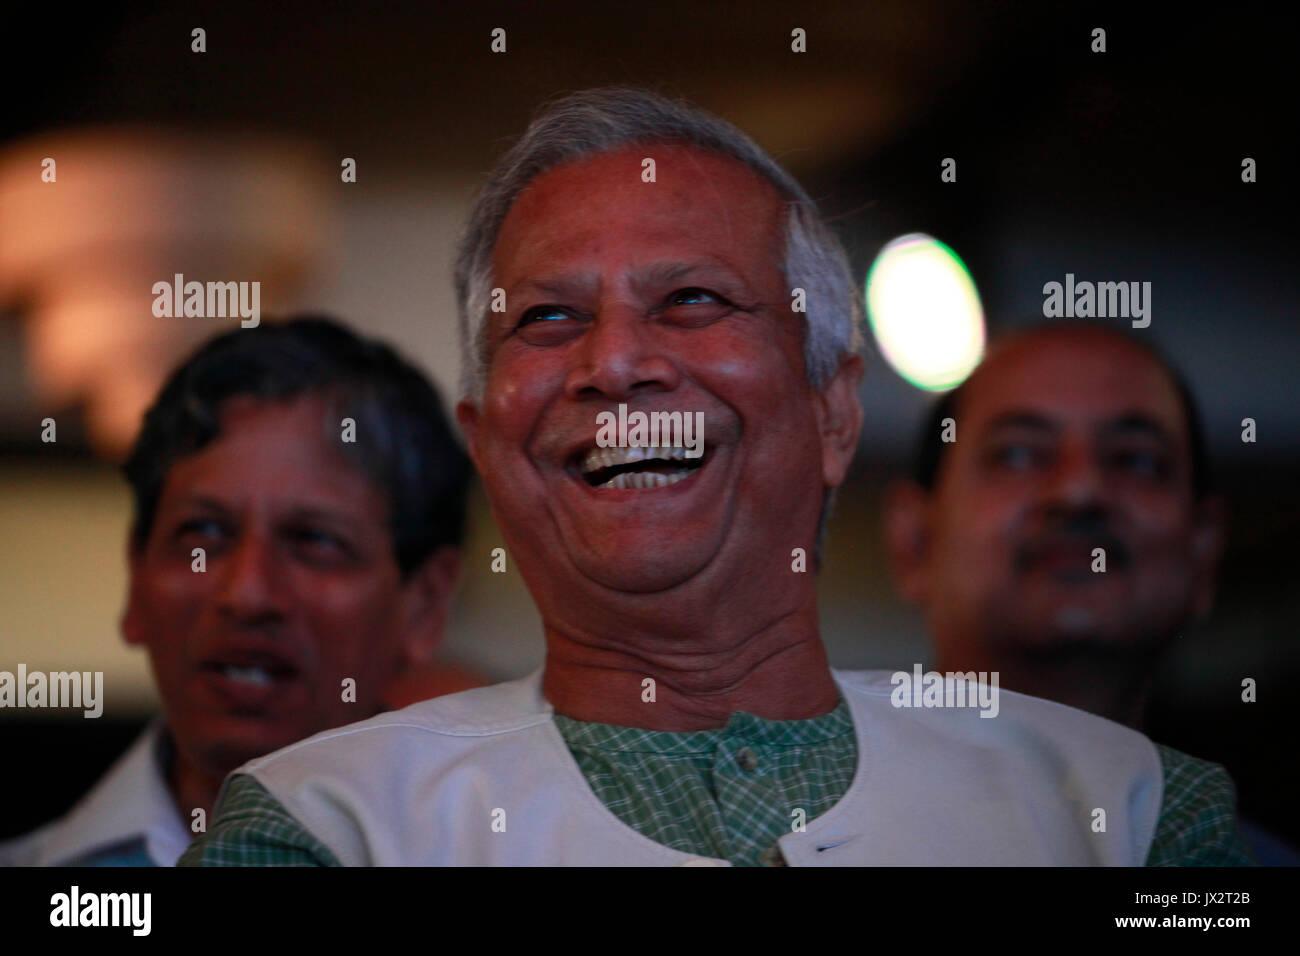 Portrait of Nobel Prize Laureate Professor Muhammad Yunus, who won the Nobel Peace Prize in 2006, on June 28, 2014 Stock Photo